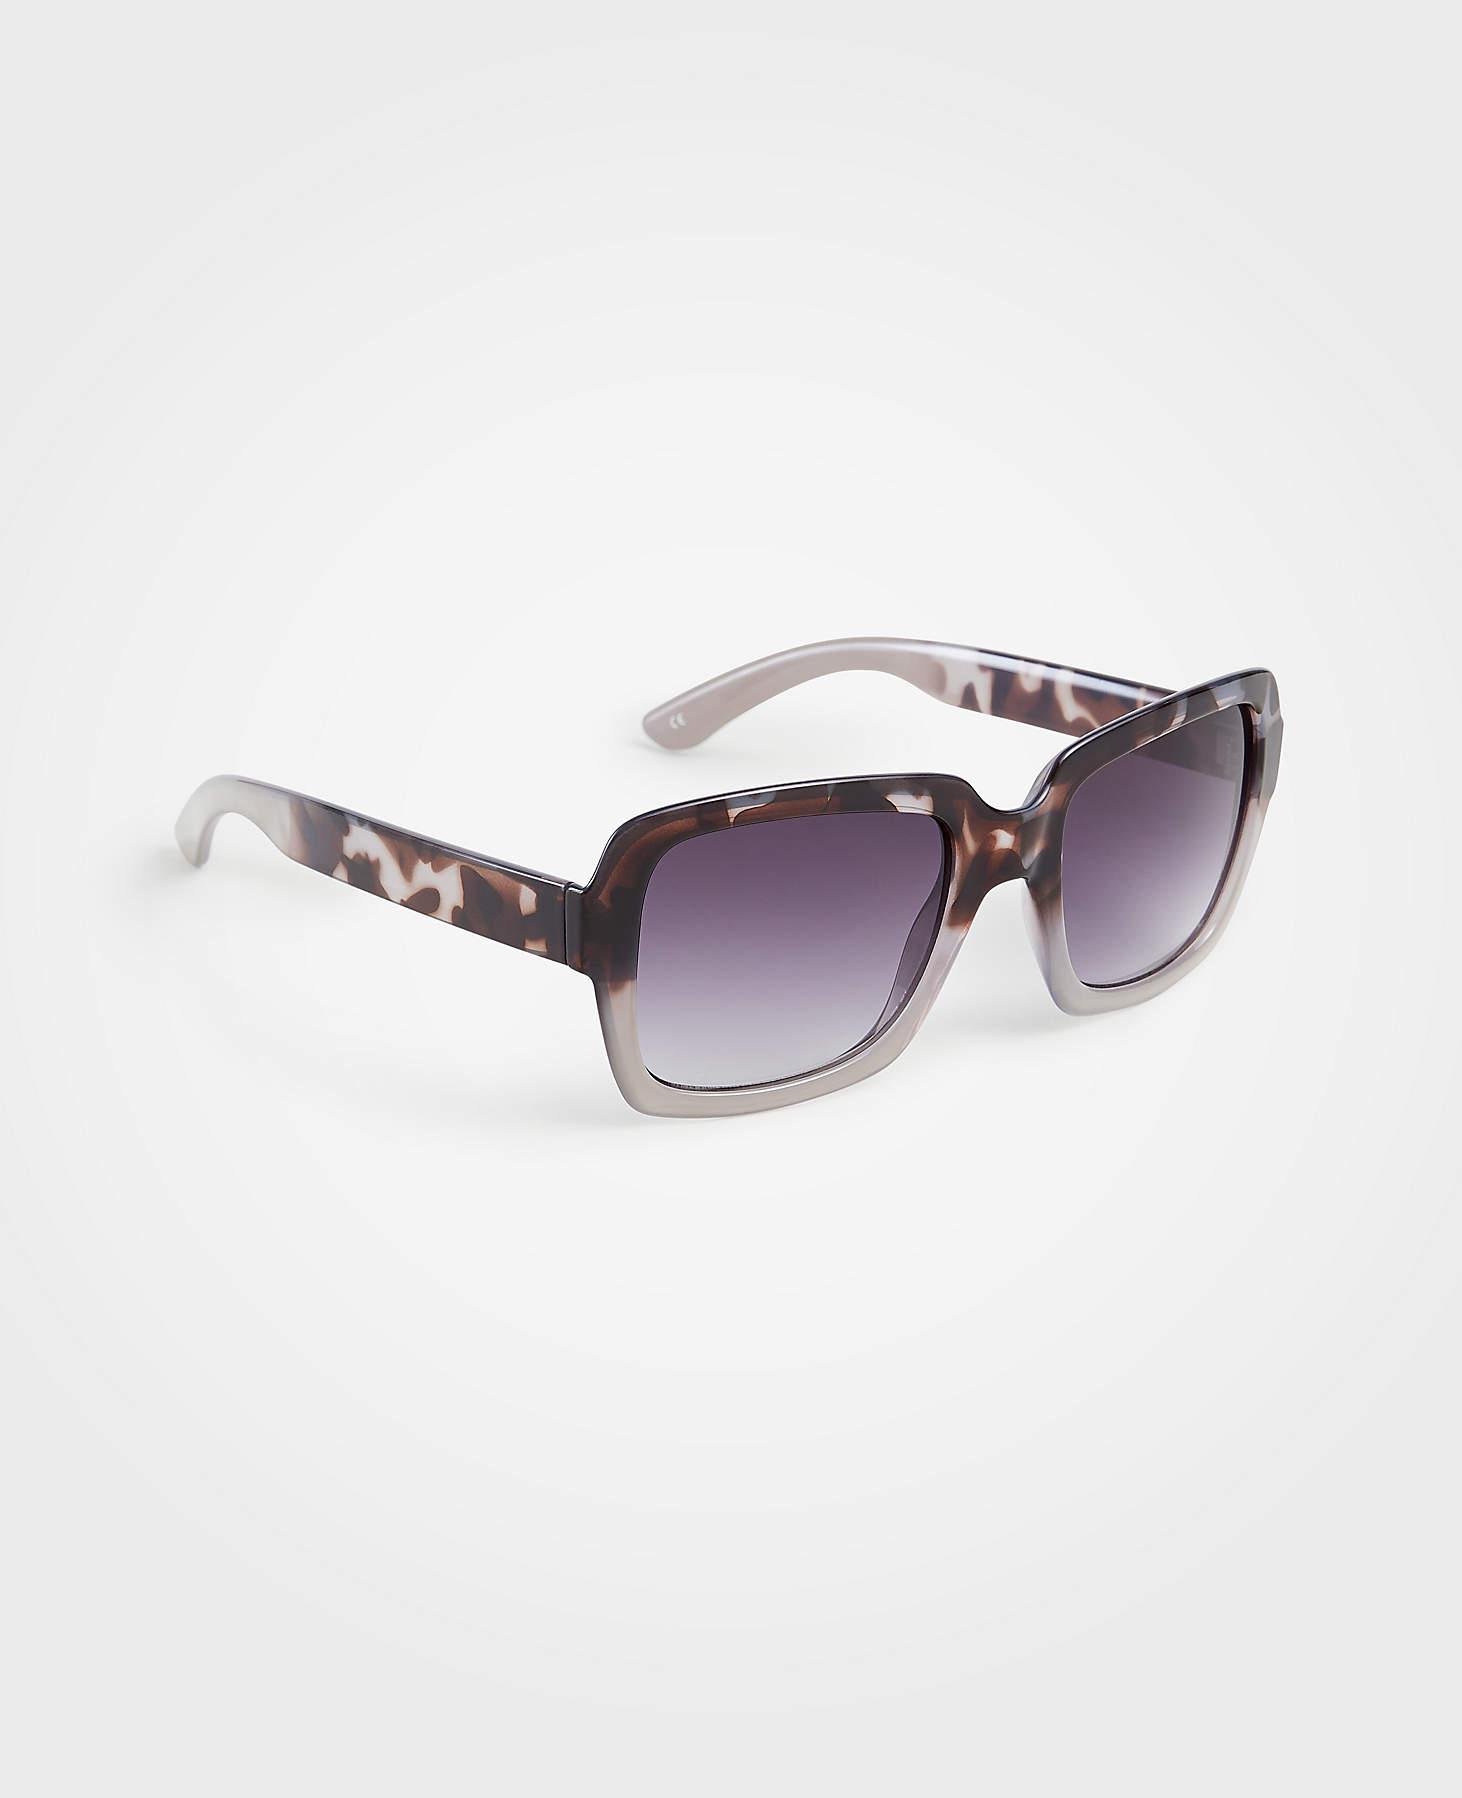 a3562c3db14 Ann Taylor. Women s Winter Square Sunglasses